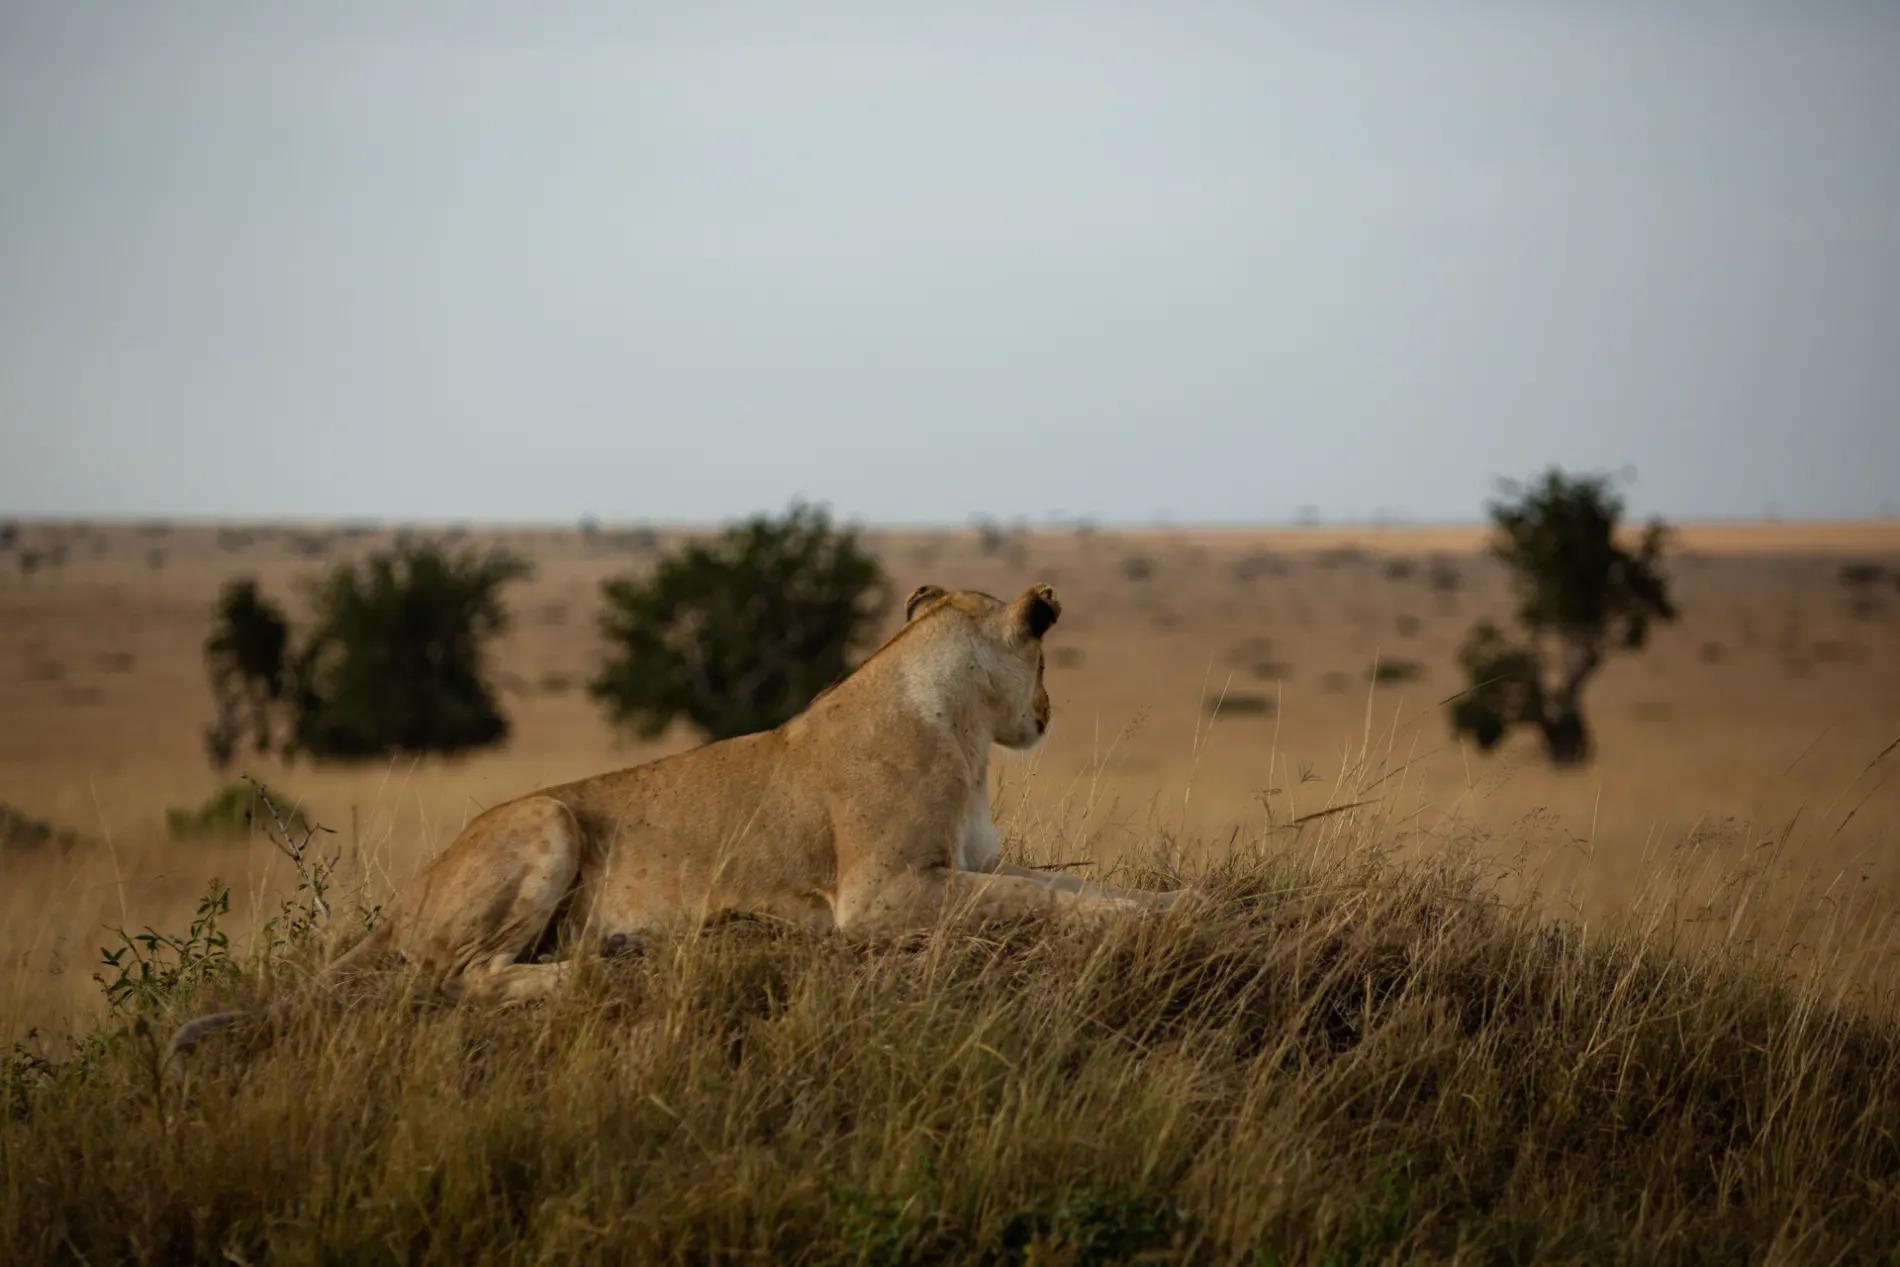 Lioness awake